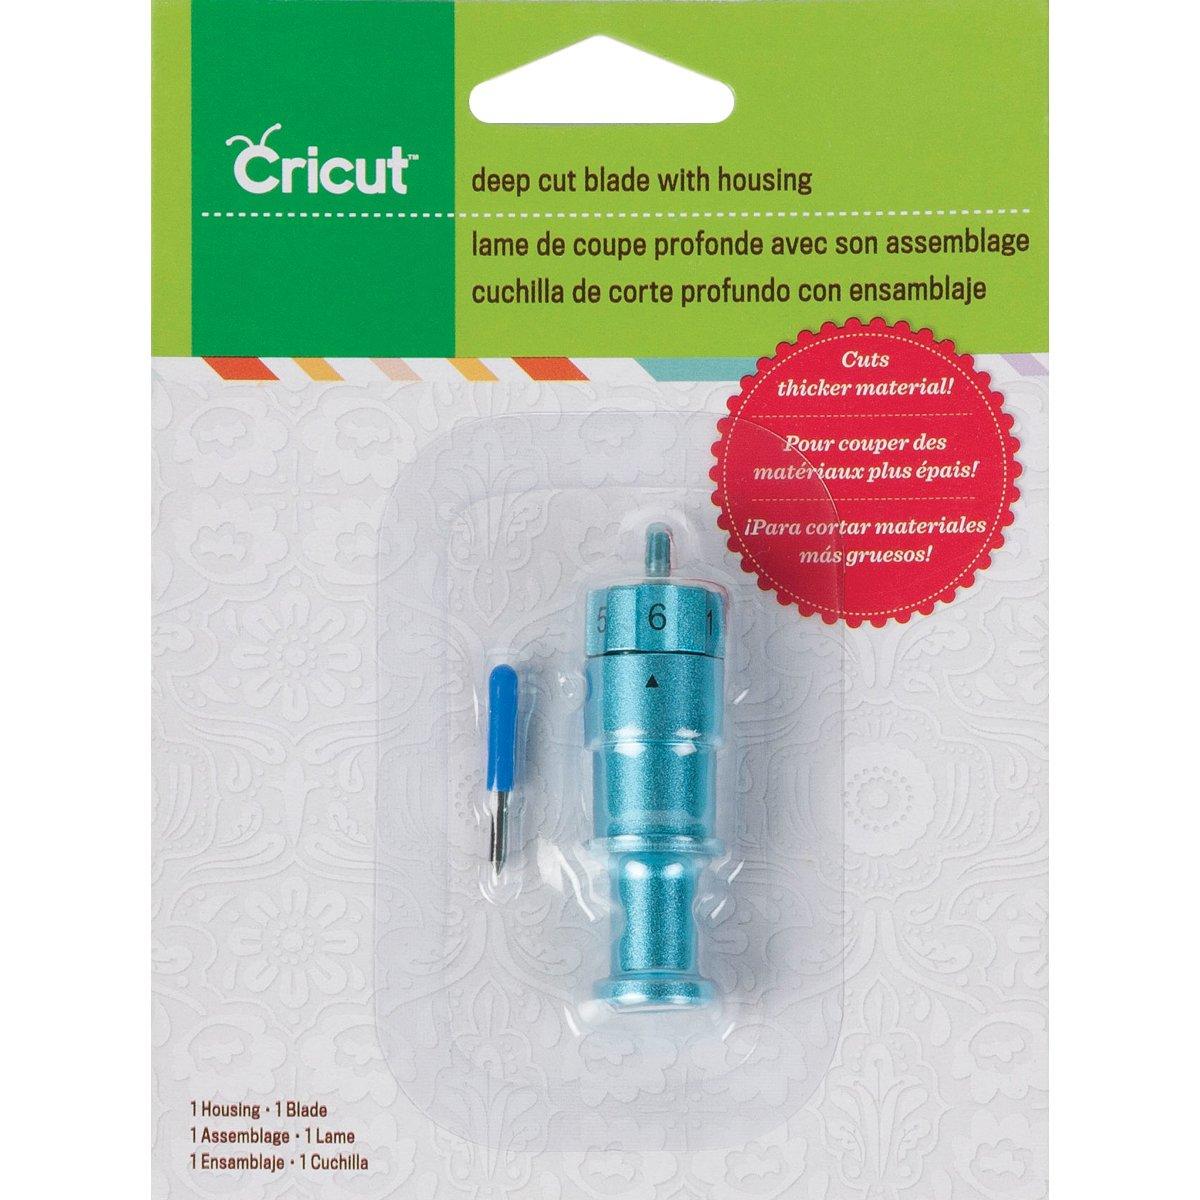 Cricut 2001401 Deep Cut Blade and Housing by Cricut